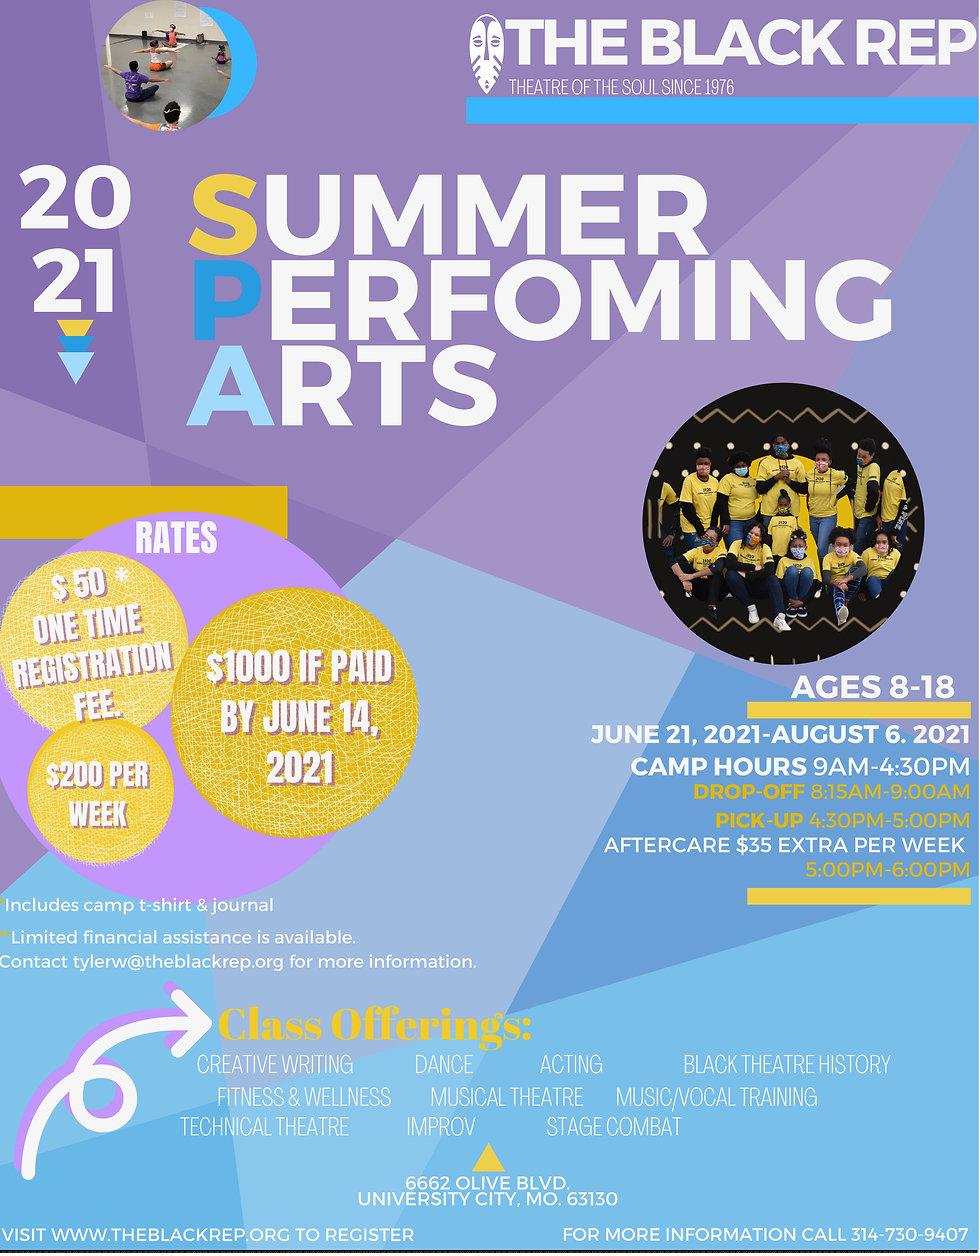 Summer Perfoming Arts (3)-1a.jpg